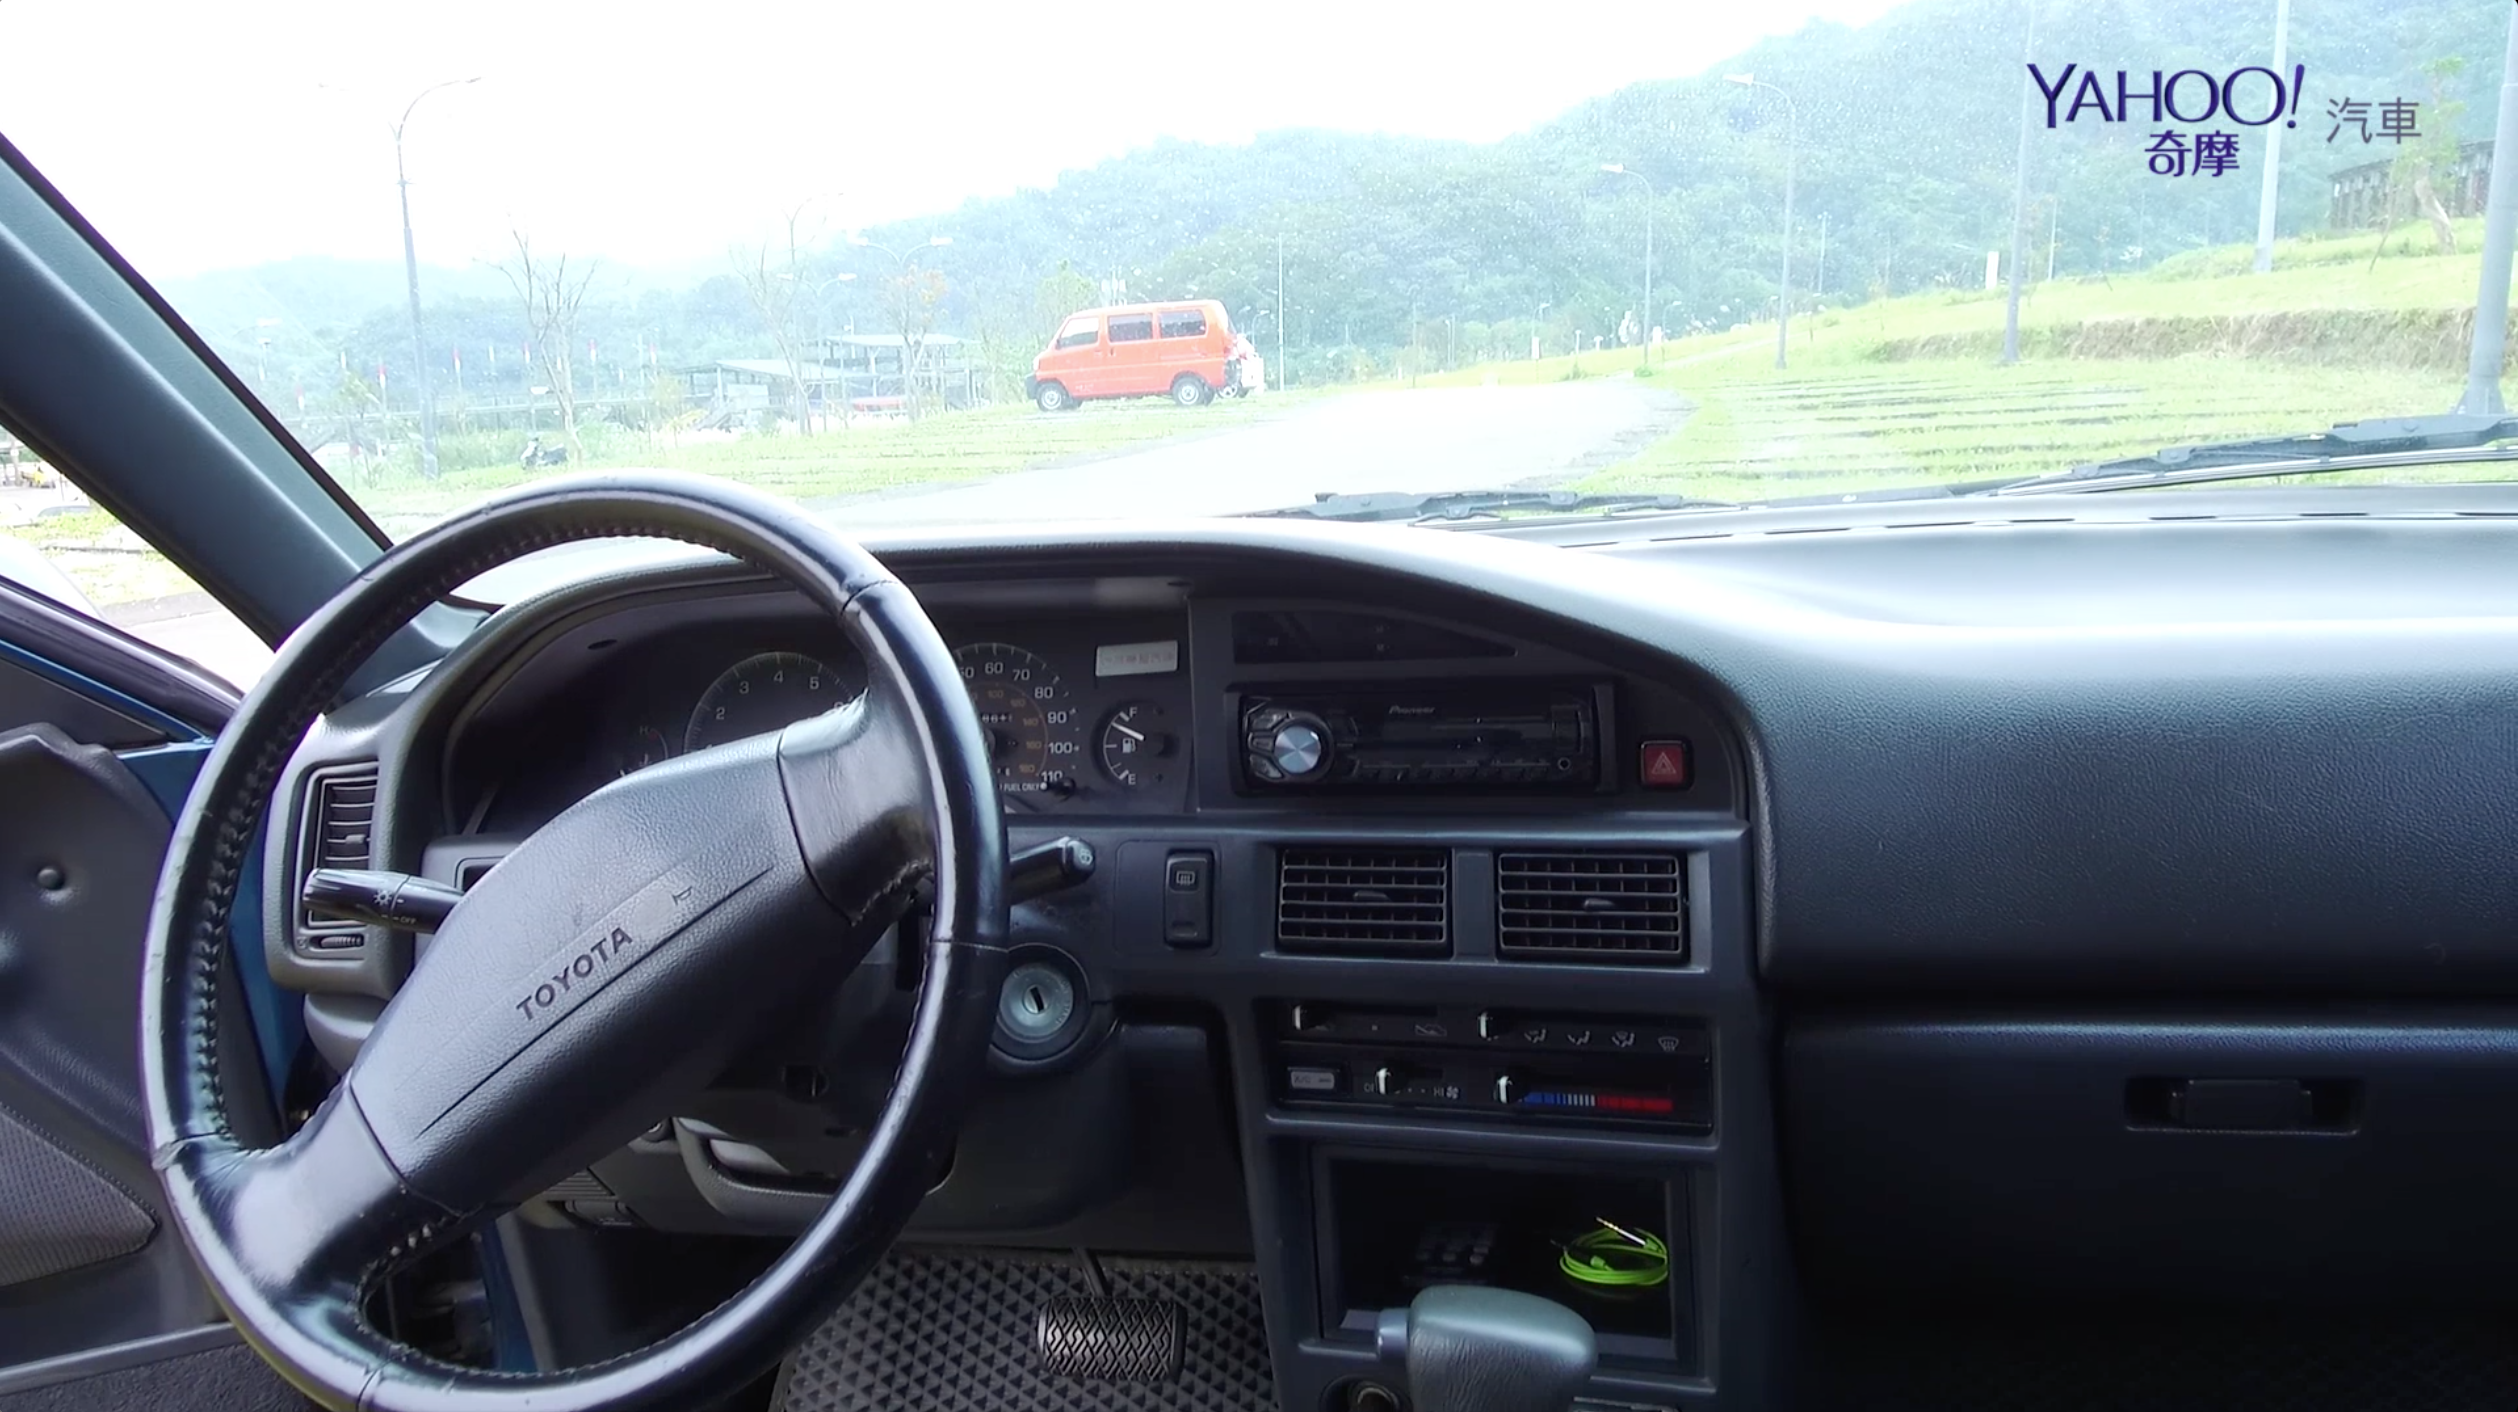 【頂極老汽車】Vol.4 神車Altis的前身 - 1991年TOYOTA Corolla 六代 L-Touring Limited